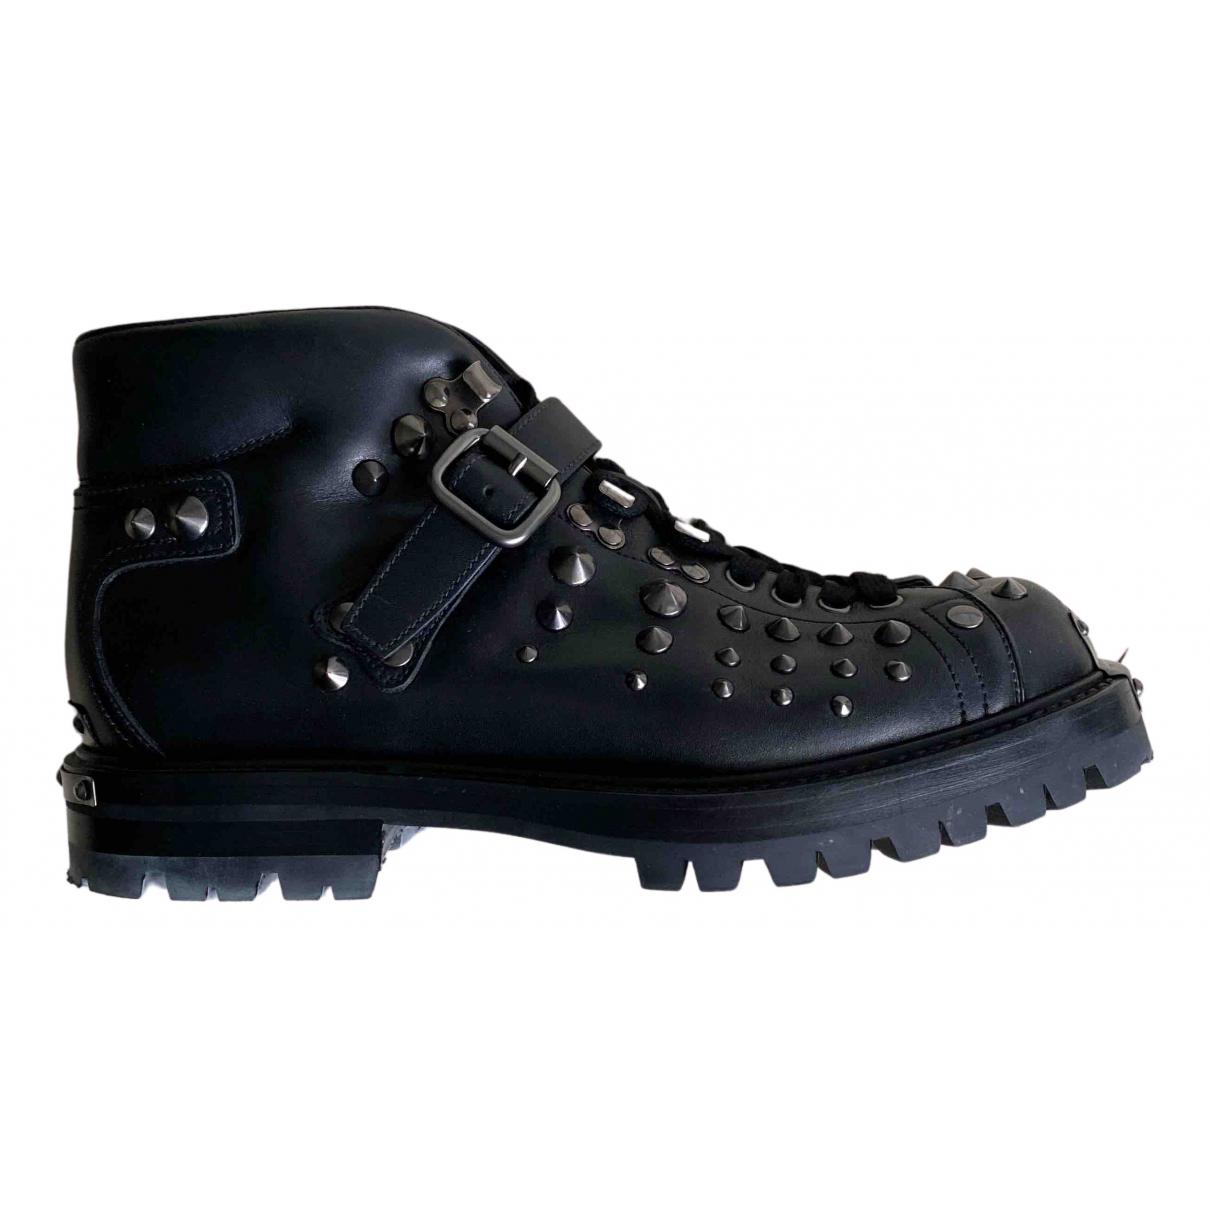 Prada N Black Leather Boots for Men 40.5 EU